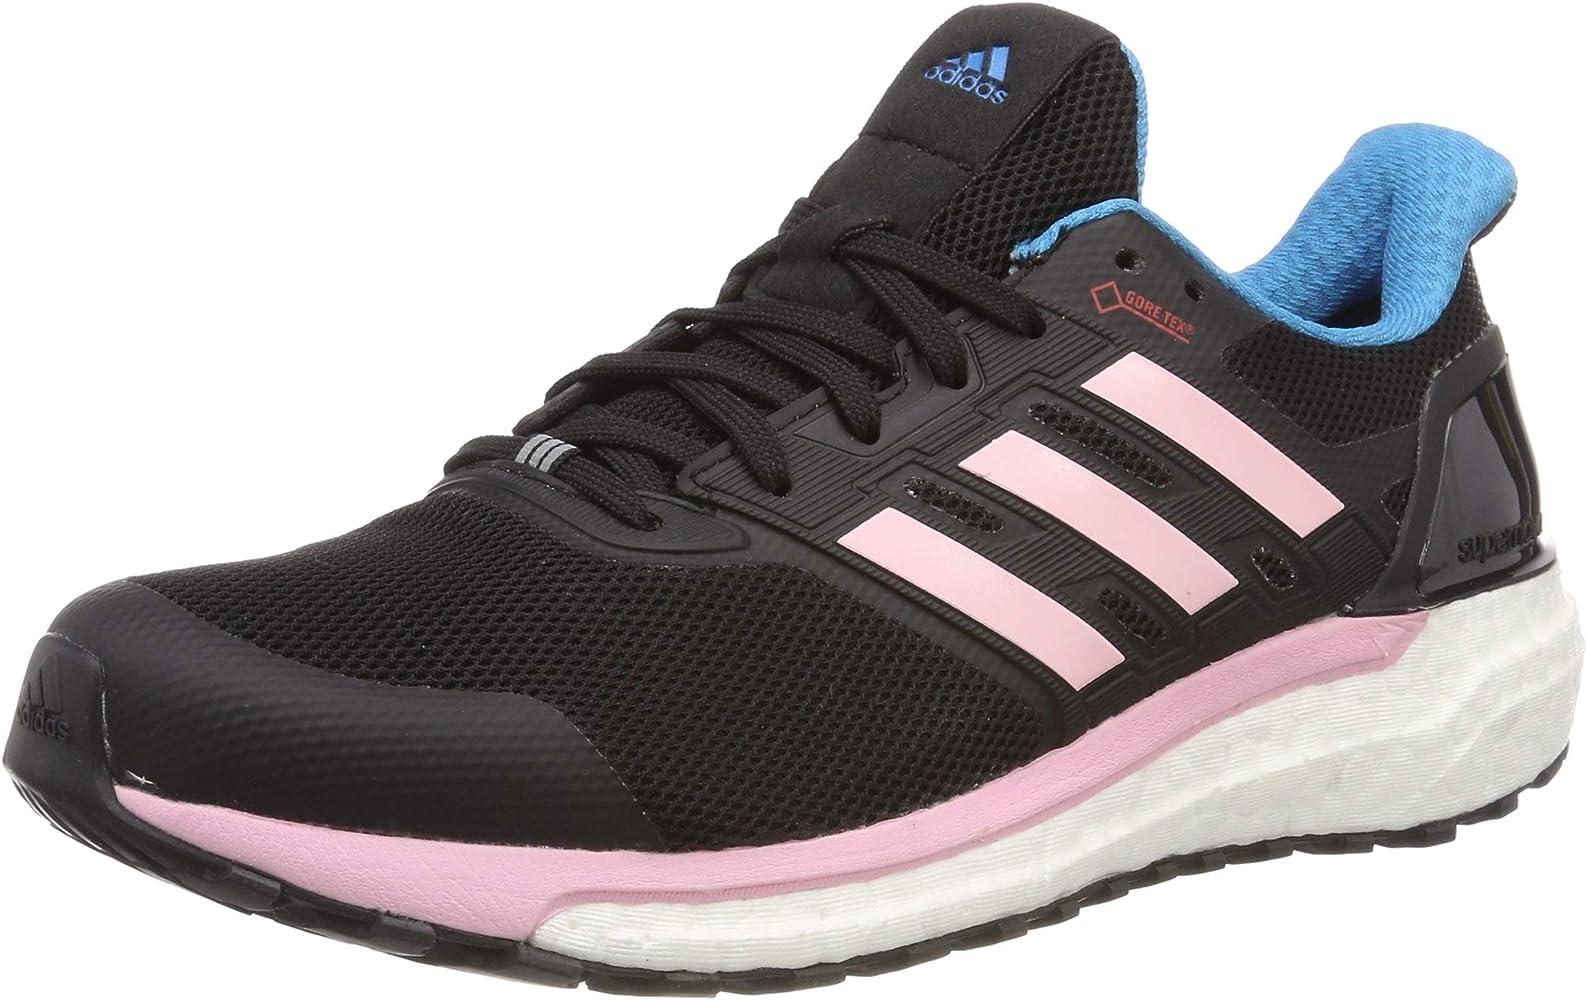 adidas Supernova GTX W, Zapatillas de Running para Mujer, Negro ...